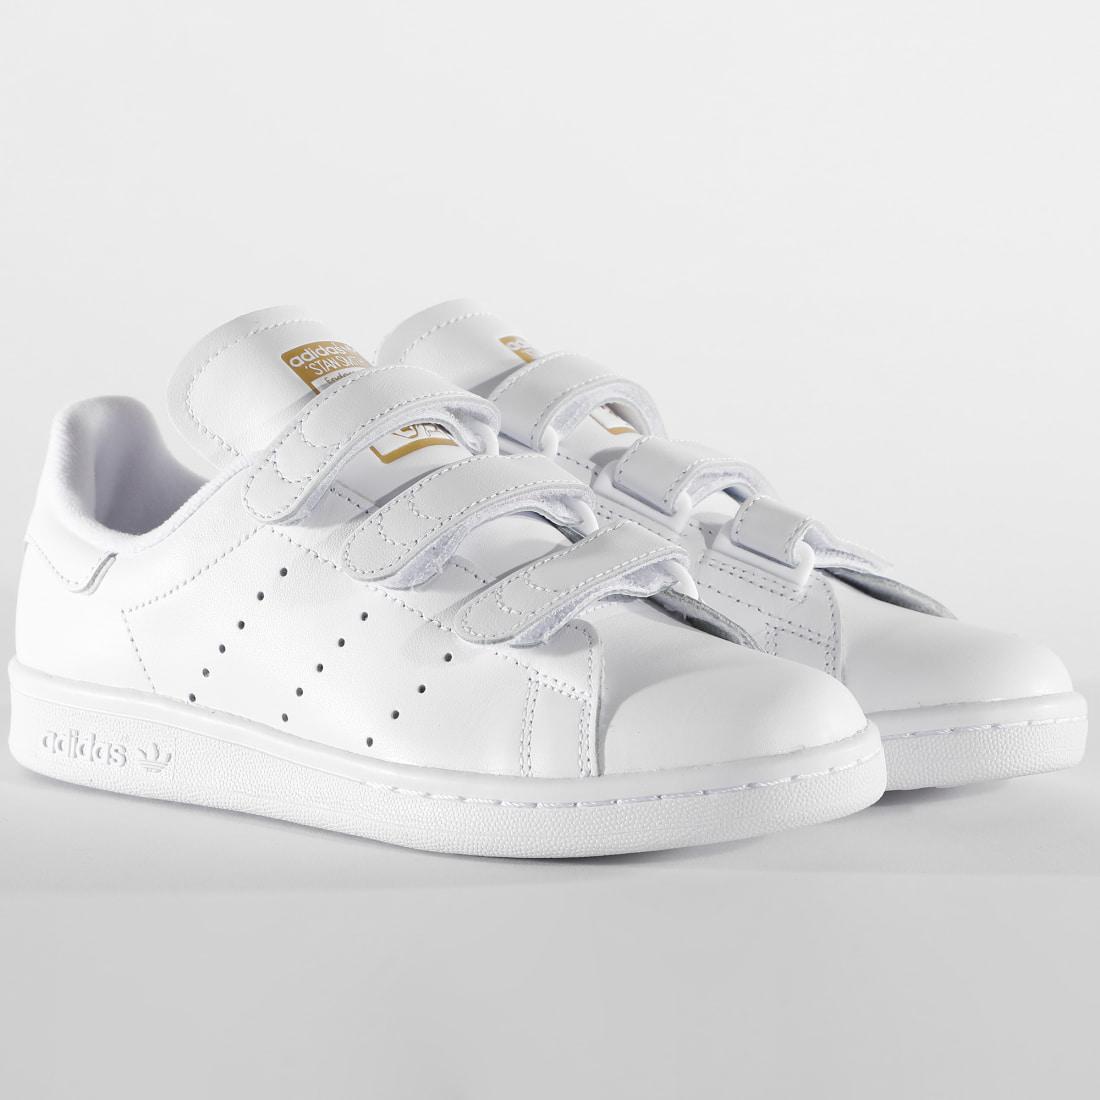 Adidas Originals Stan Smith CF White/Gold   S75188 - Naked